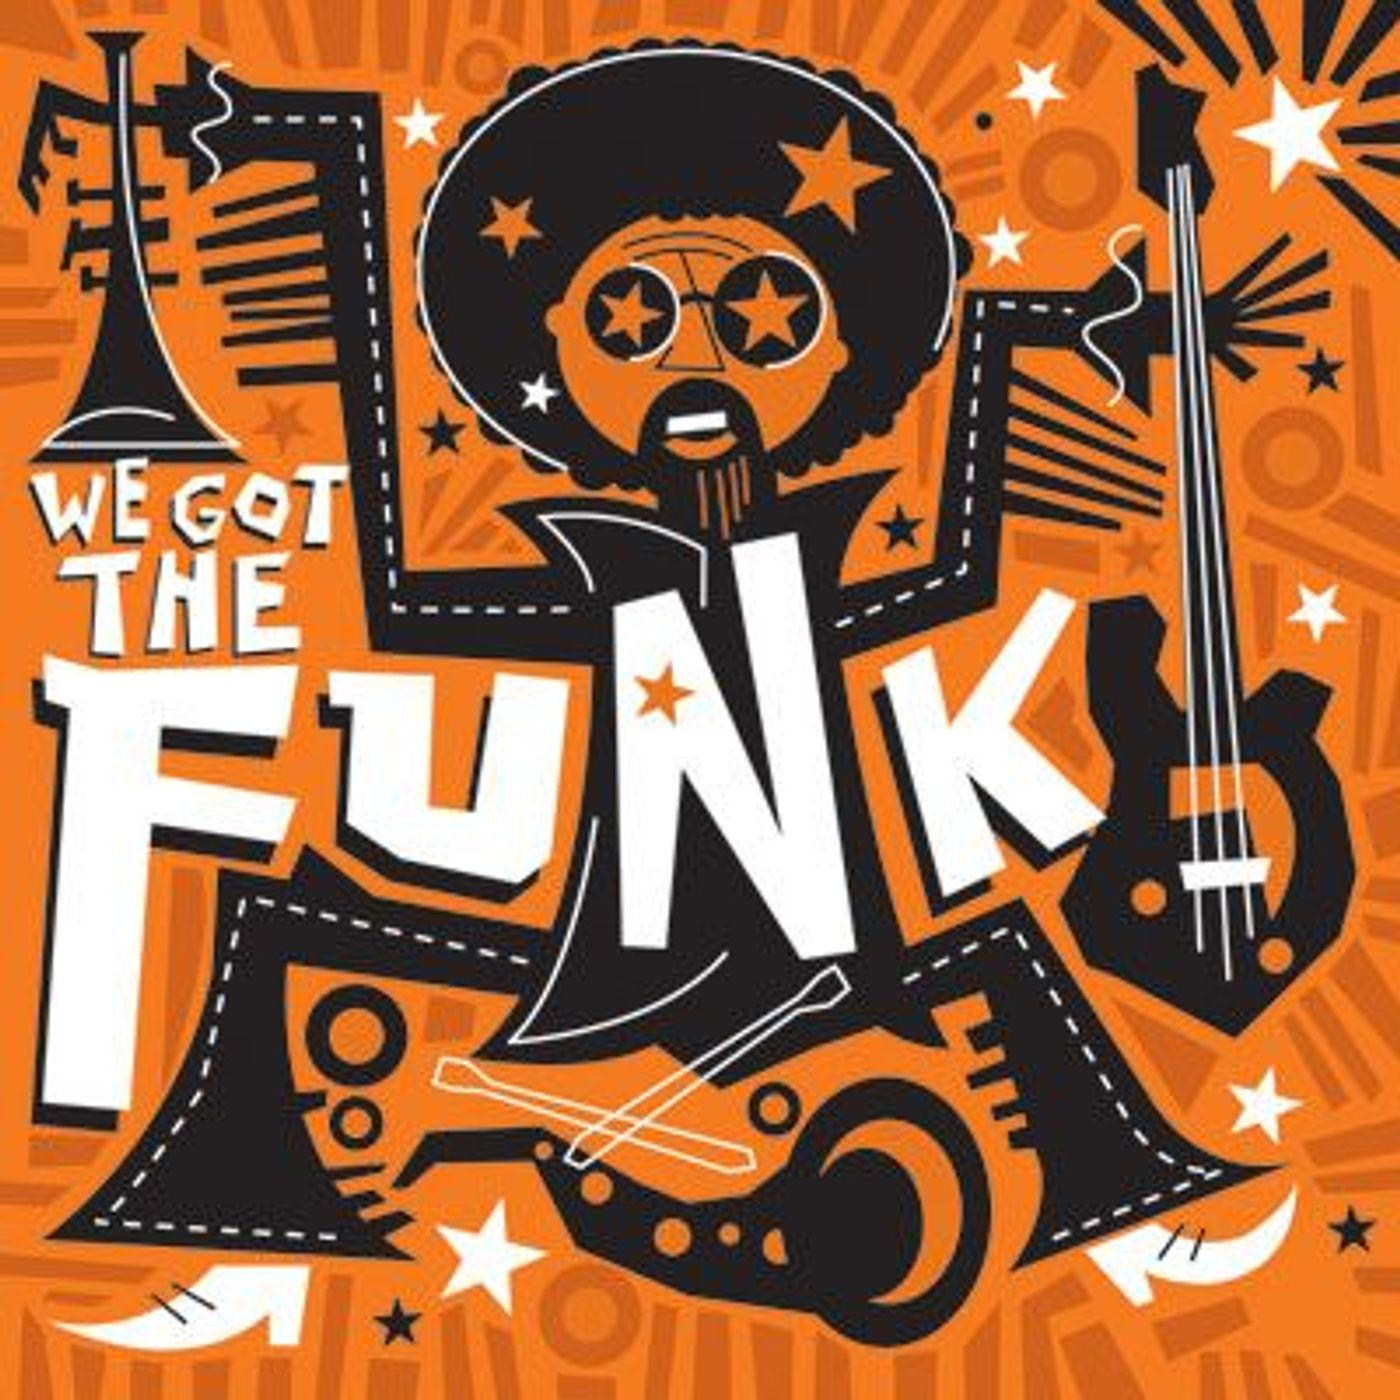 BEST OF CLASSIC ROCK LIVE playlist da classikera #1330 #funkymusic funky60s #whatif #wearamask #stayhome #Loki #f9 #xbox #LaRemesaMala